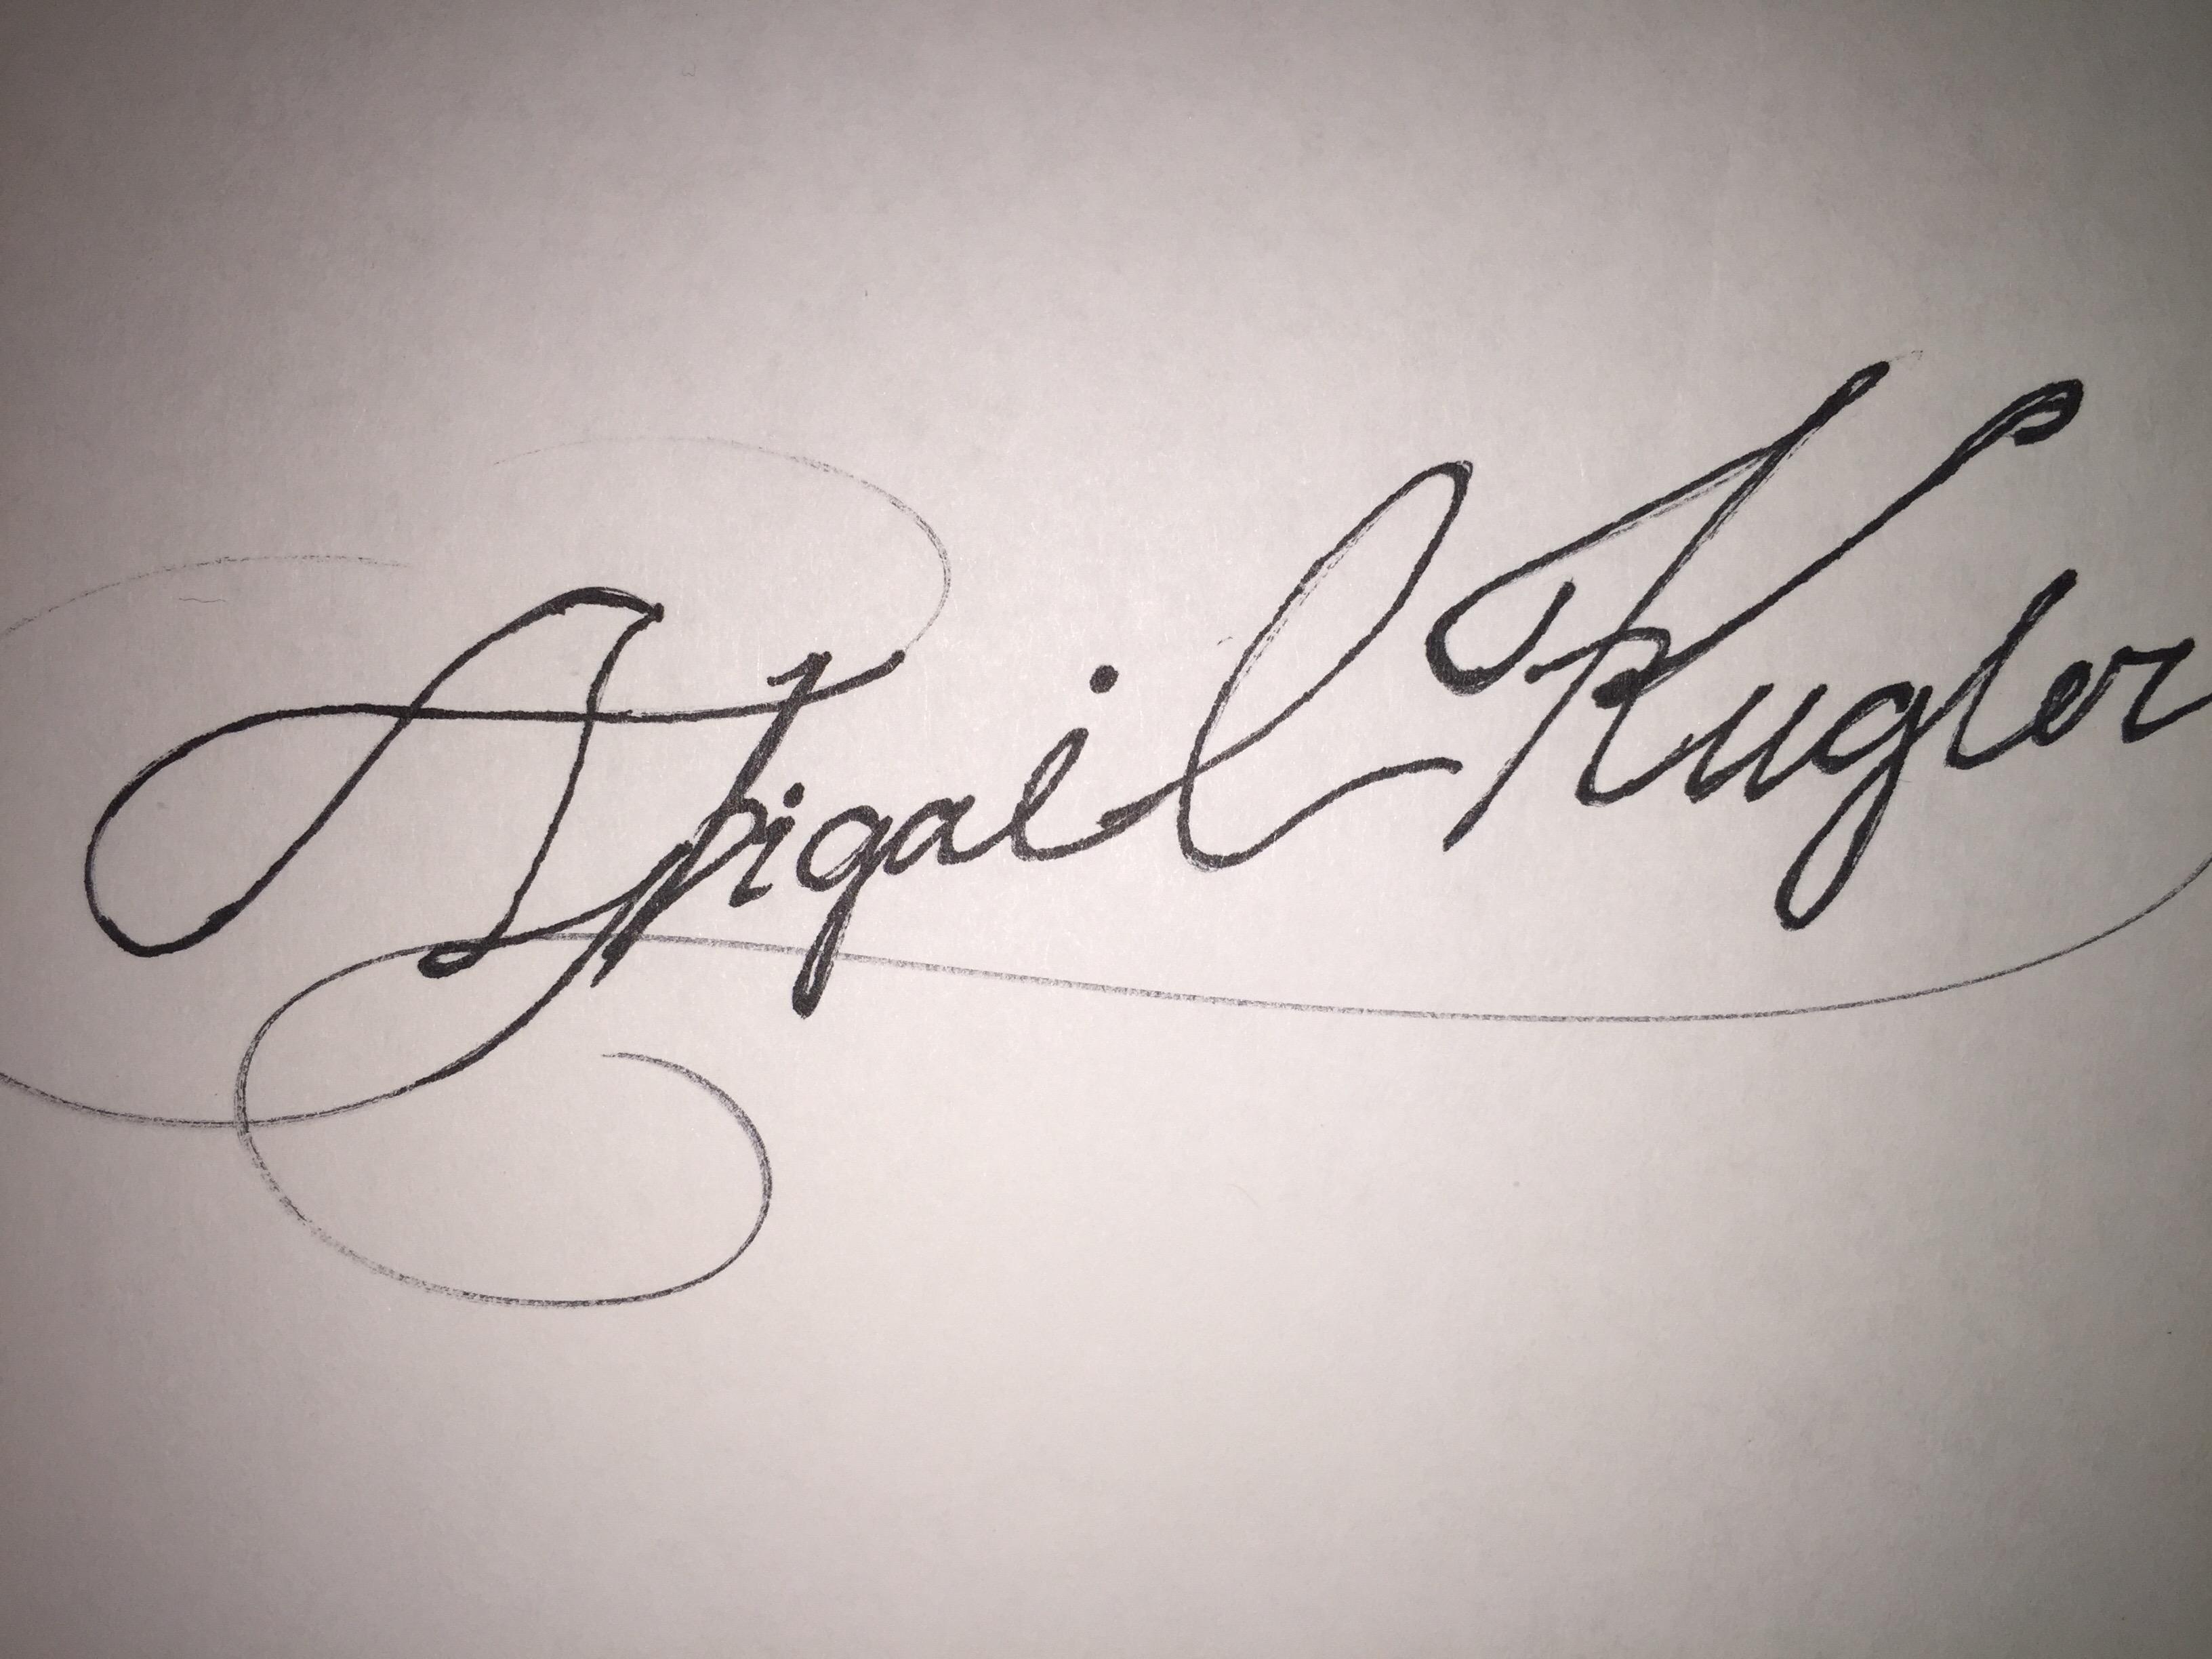 Abigail Kugler's Signature